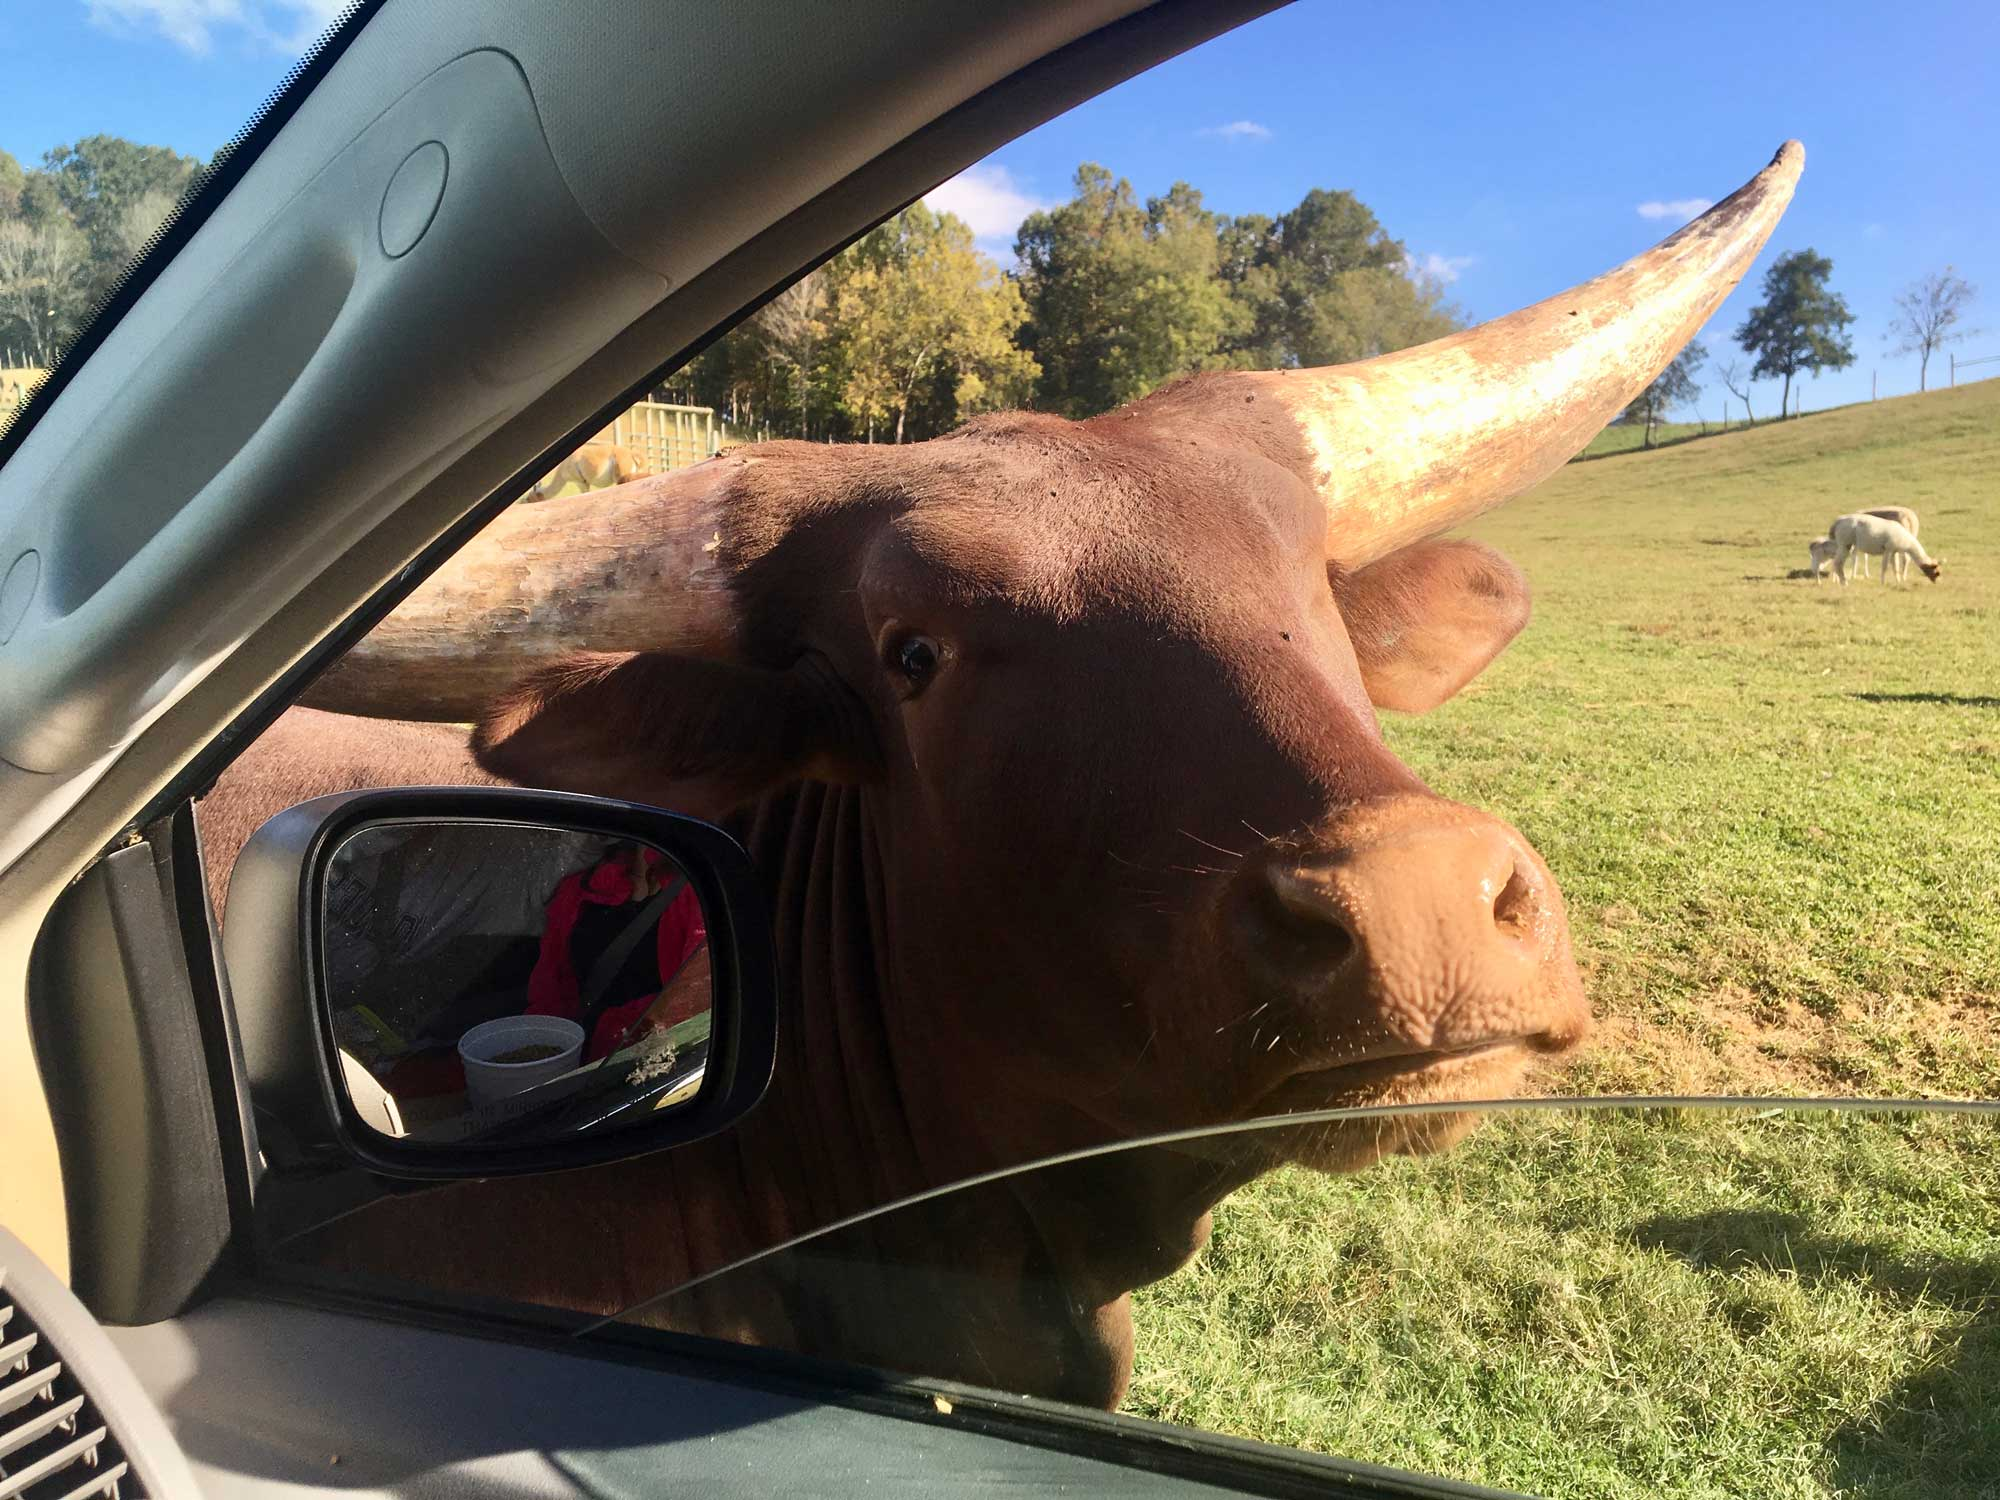 Cow at the car window at Virginia Safari Park, Natural Bridge, VA